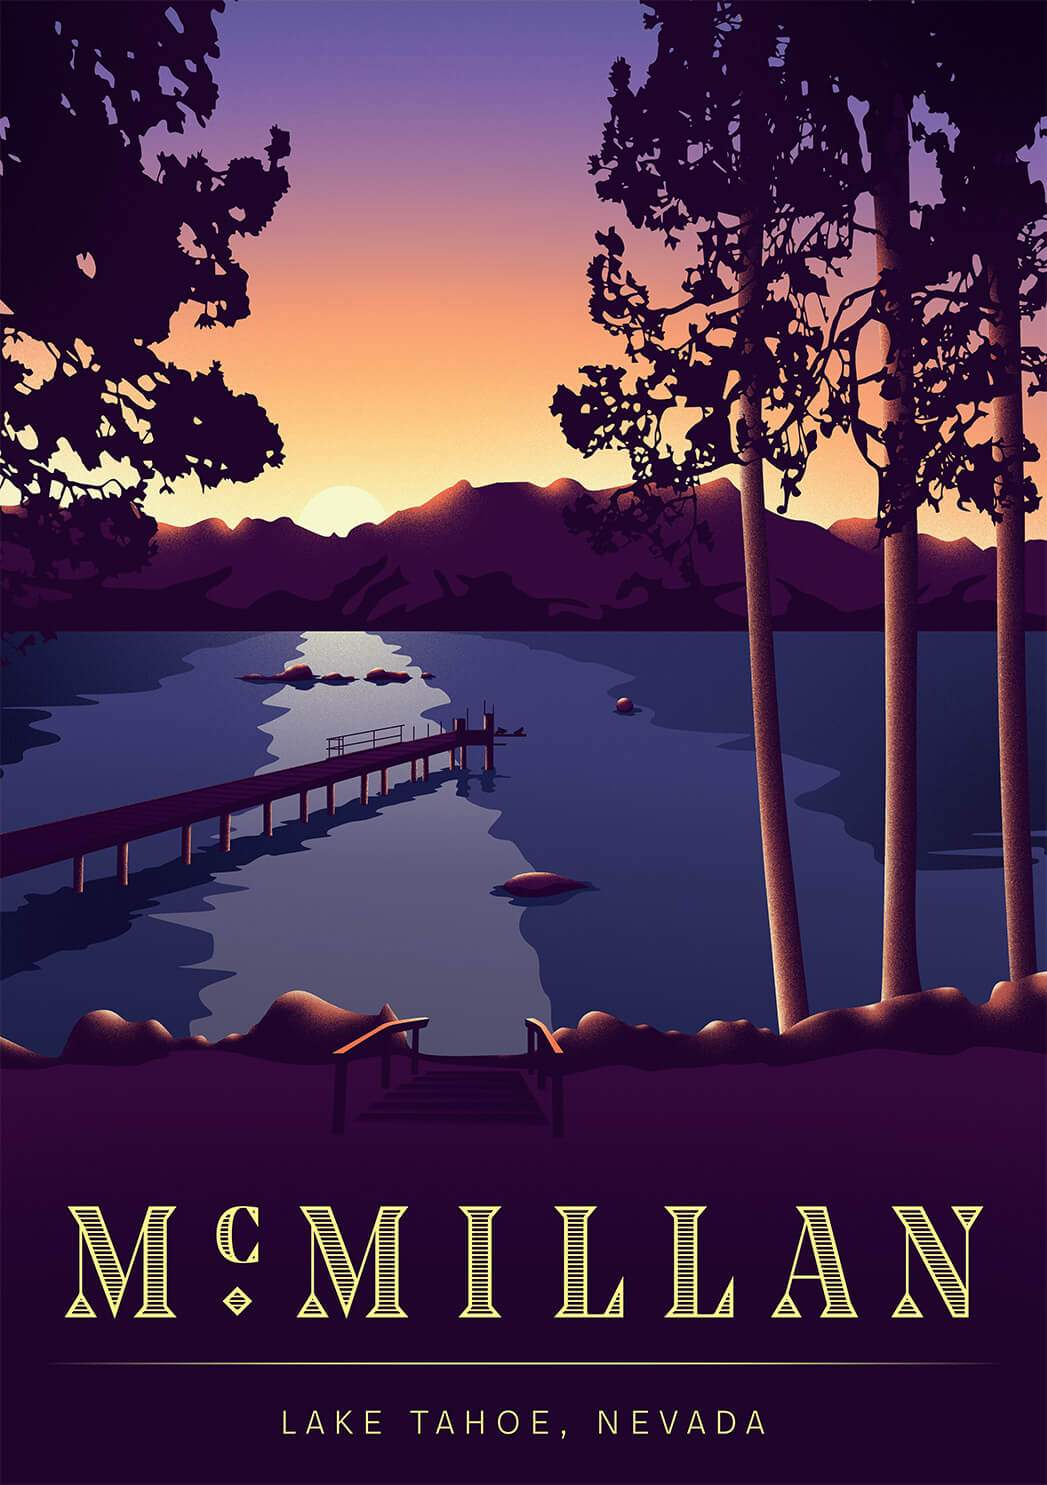 Lake_Tahoe_McMillian_House_AW